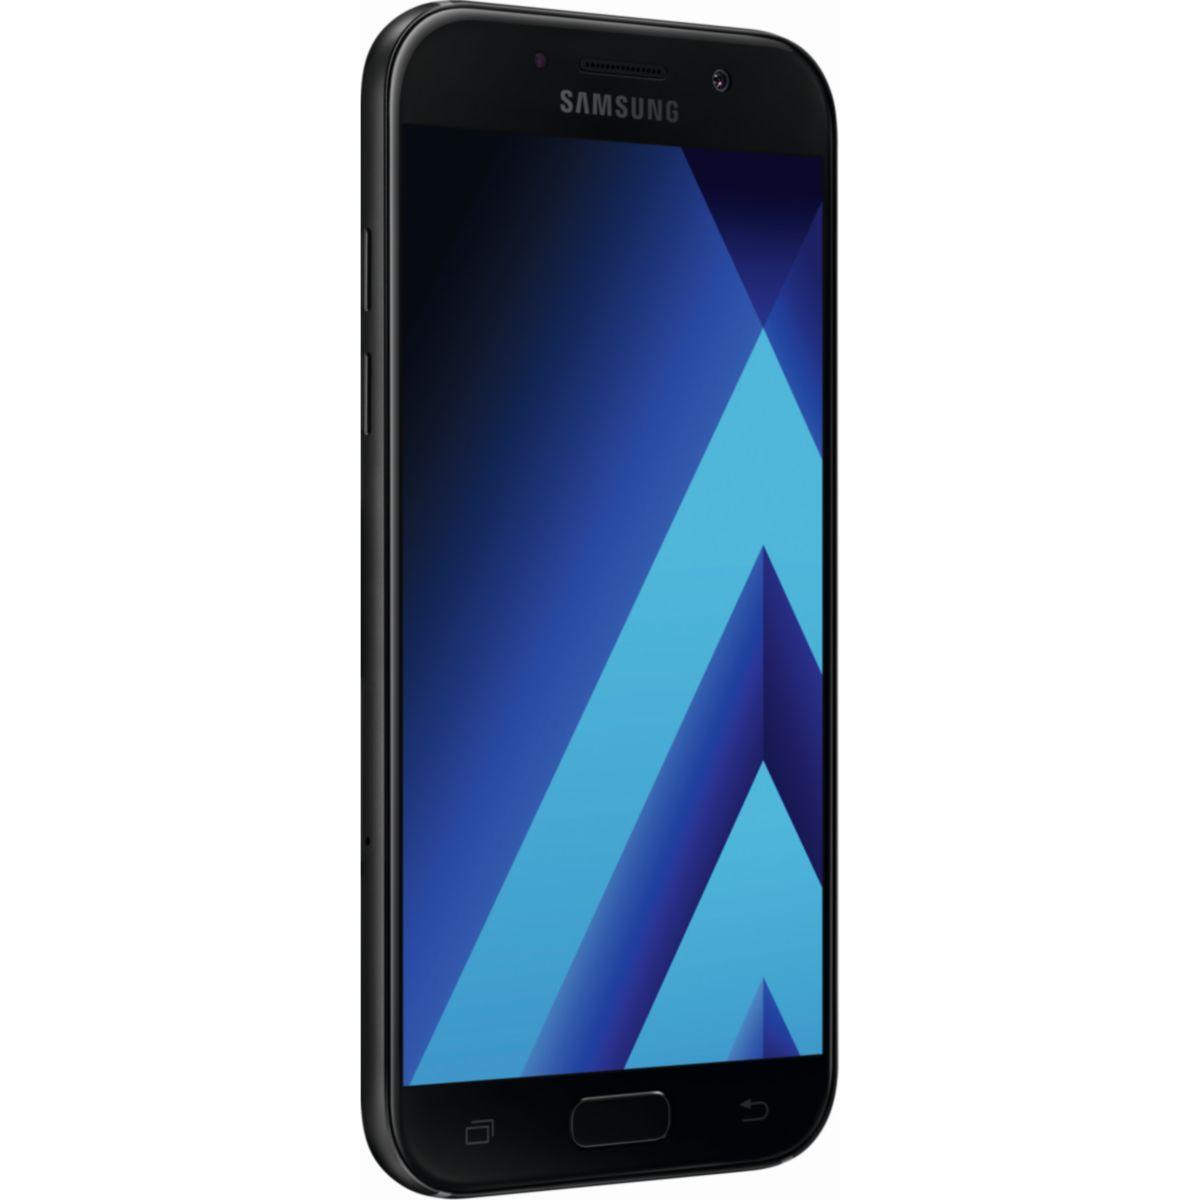 Samsung Galaxy A5 2017 SM-A520F 32GB Smartphone black-sky - DE Ware - broschei